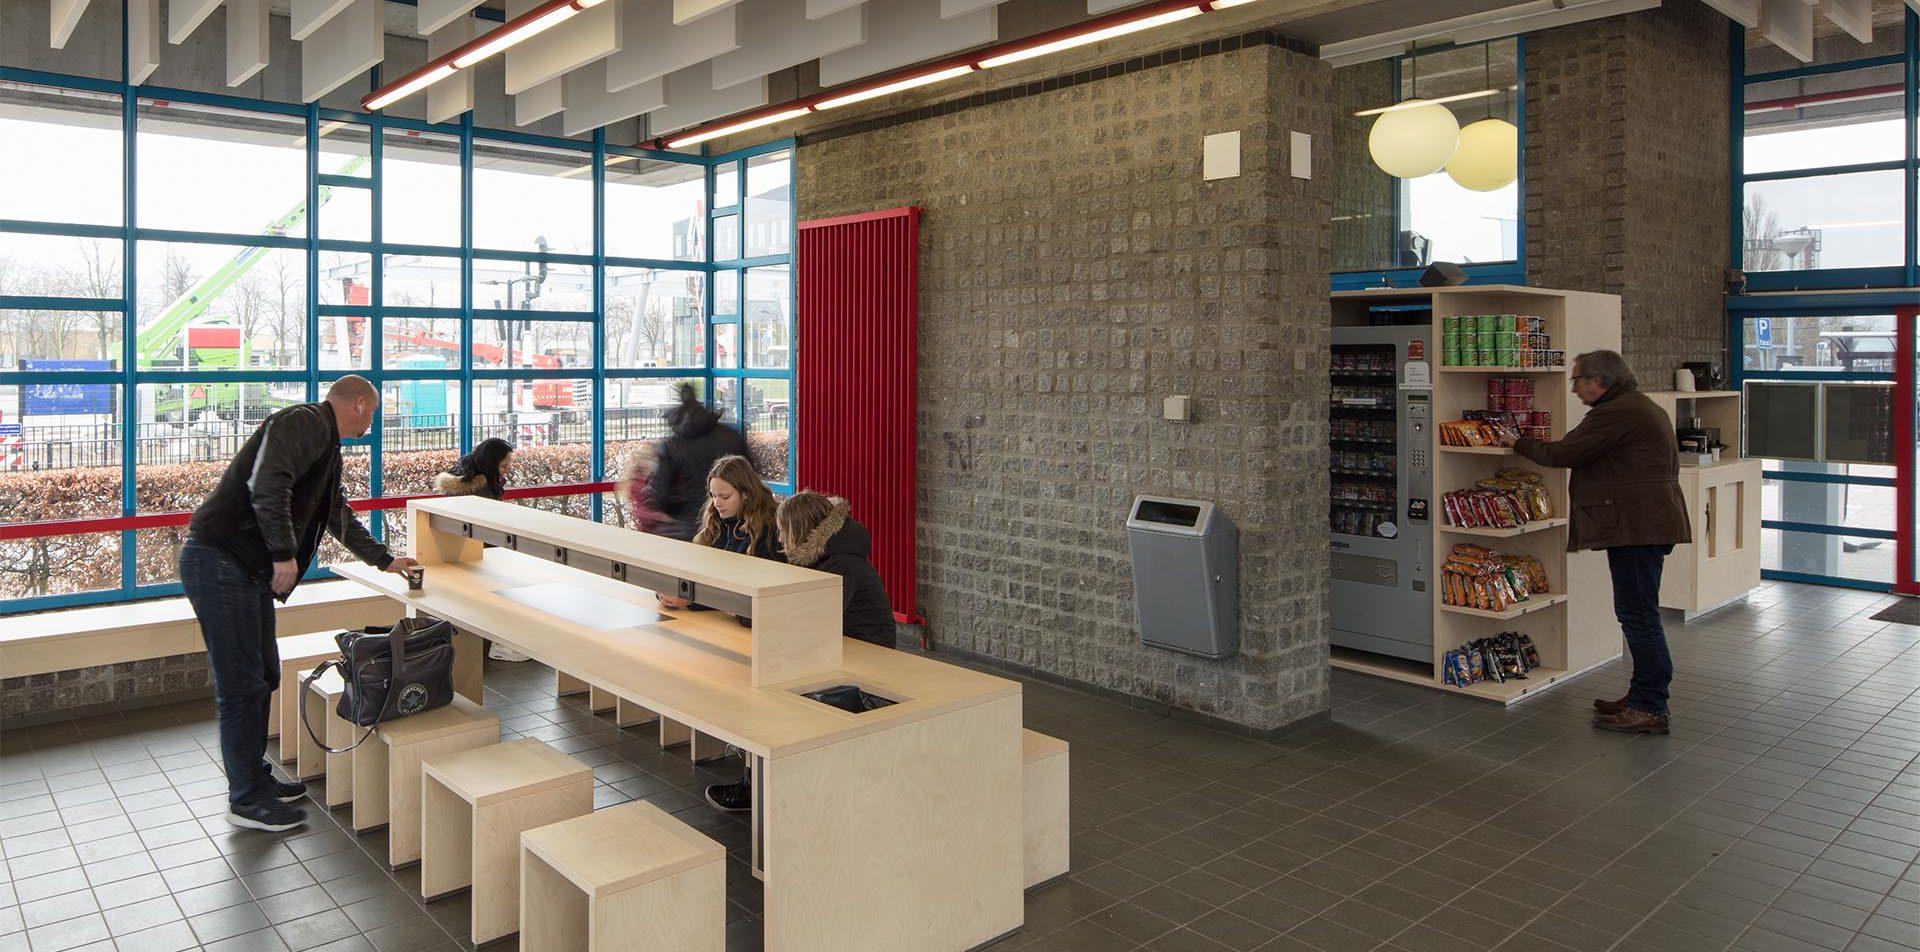 interieur-doetinchem-ontworpen-door-architect-paul-vd-ree-ilse-hartman-studiosk-movares-1